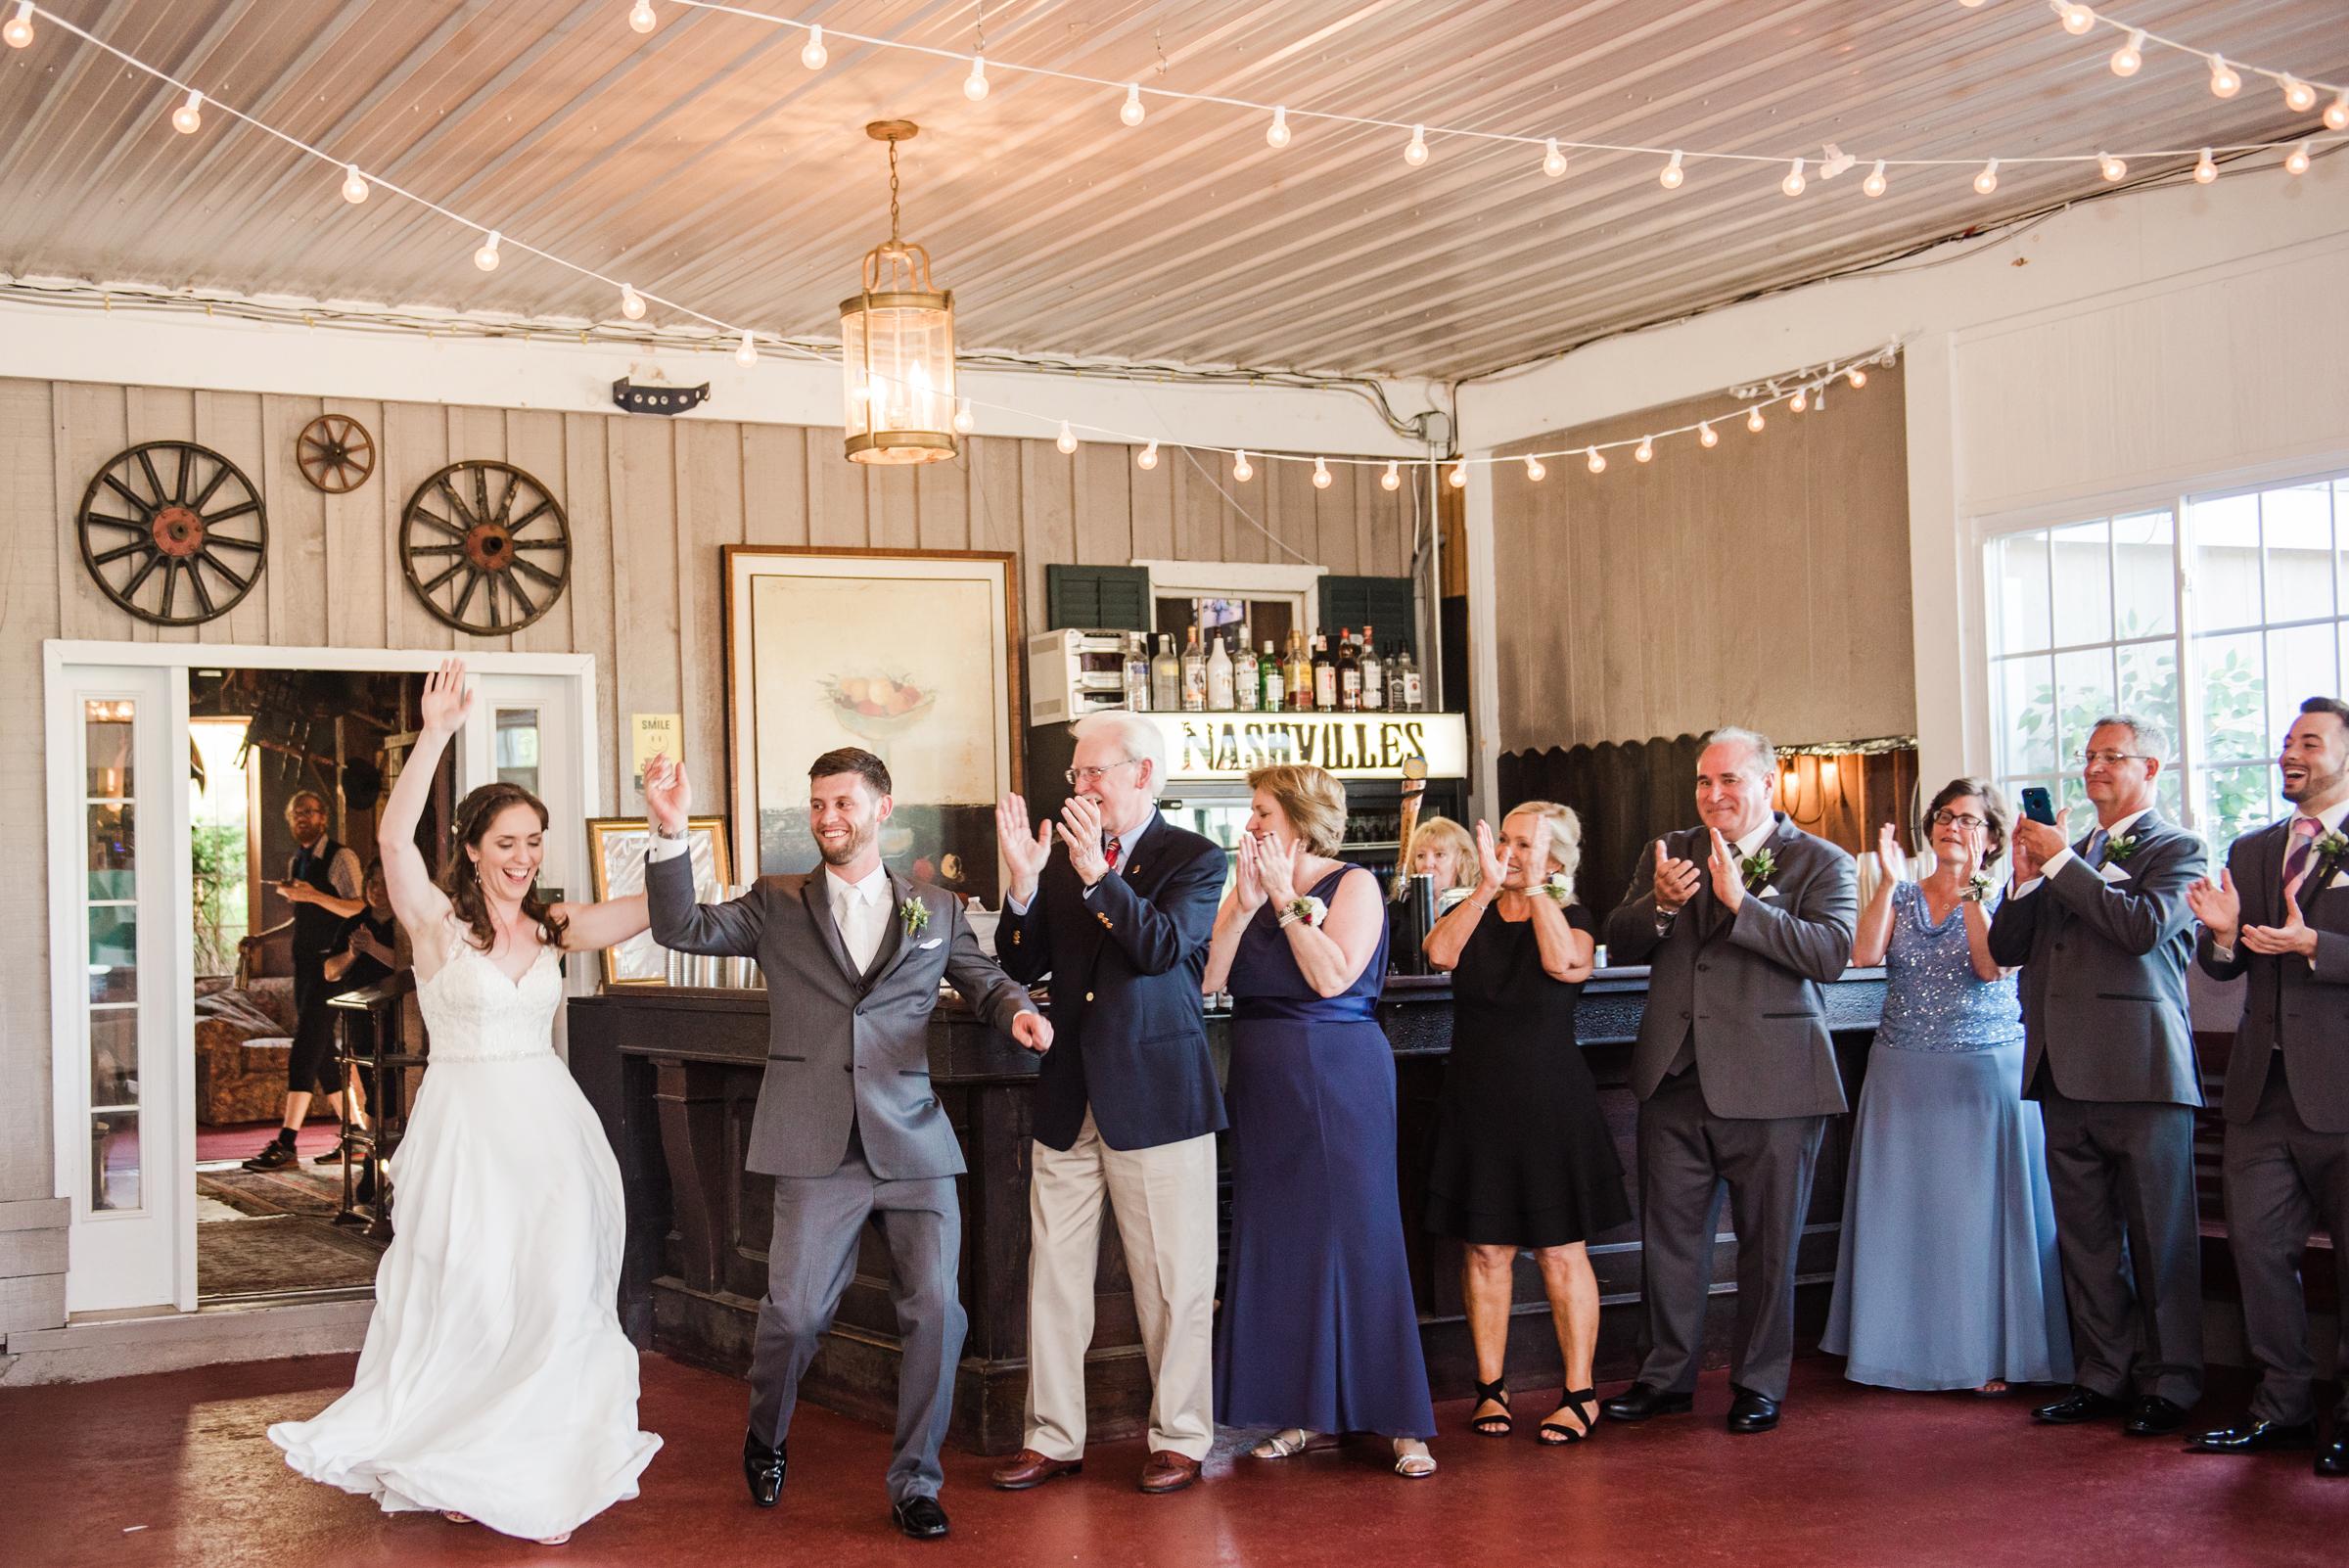 Jerris_Wadsworth_Wedding_Barn_Rochester_Wedding_JILL_STUDIO_Rochester_NY_Photographer_DSC_2835.jpg